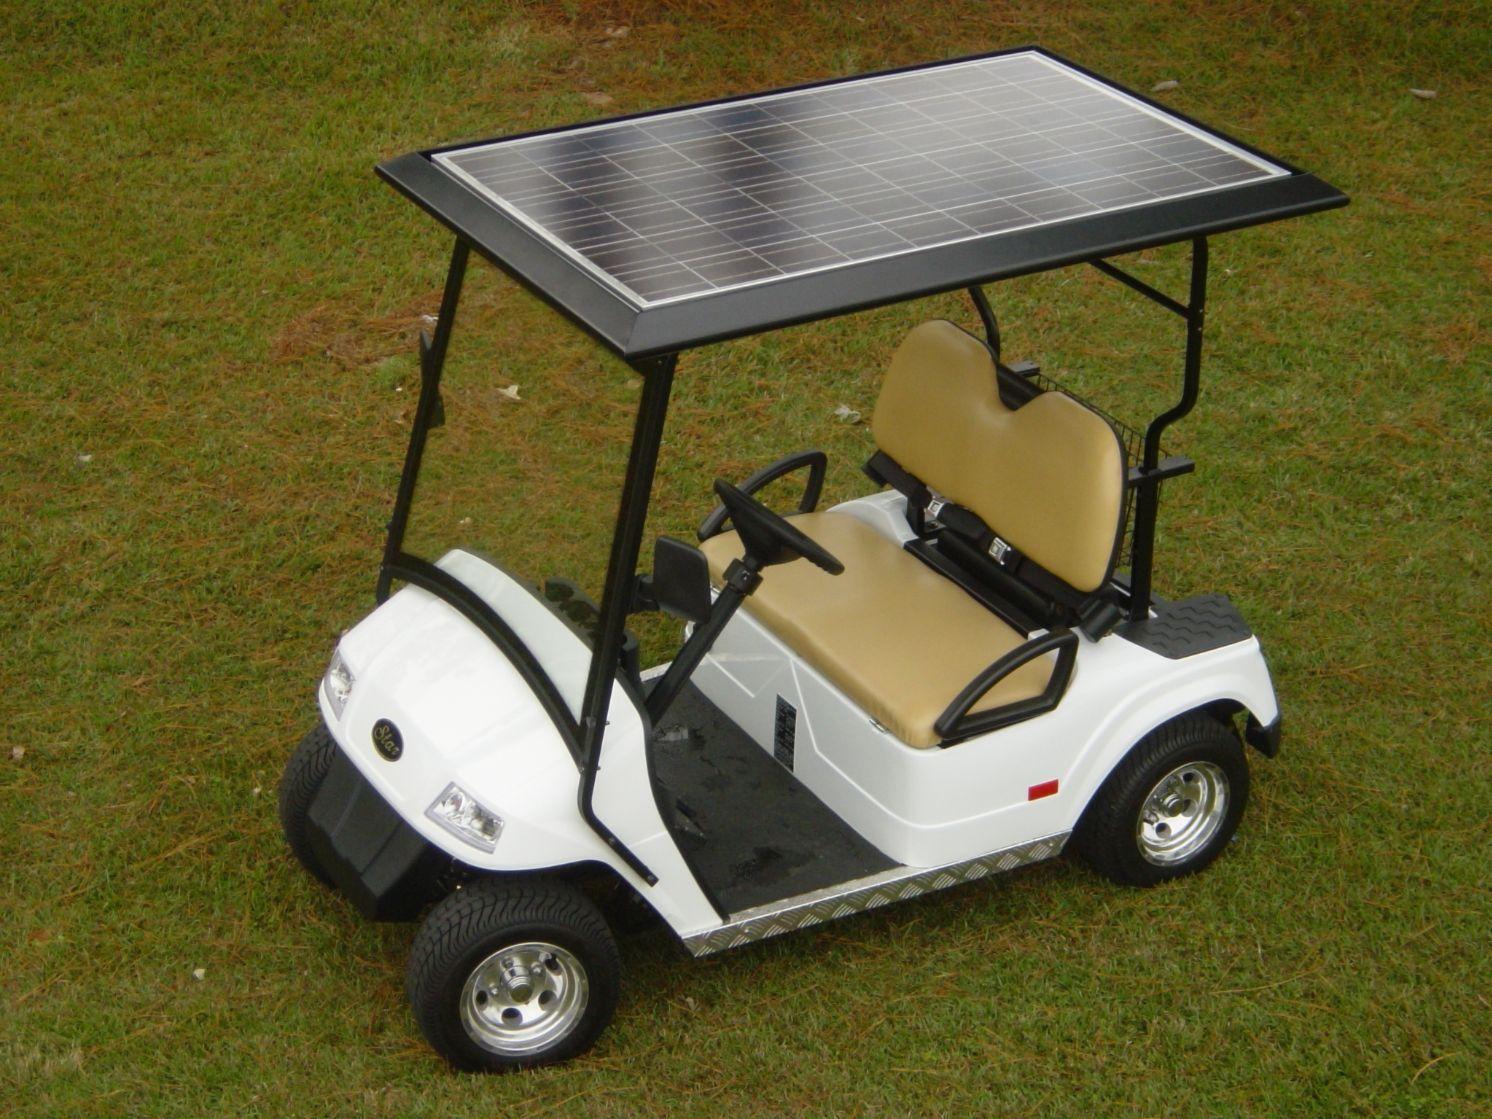 Solar Panel Golf Cart